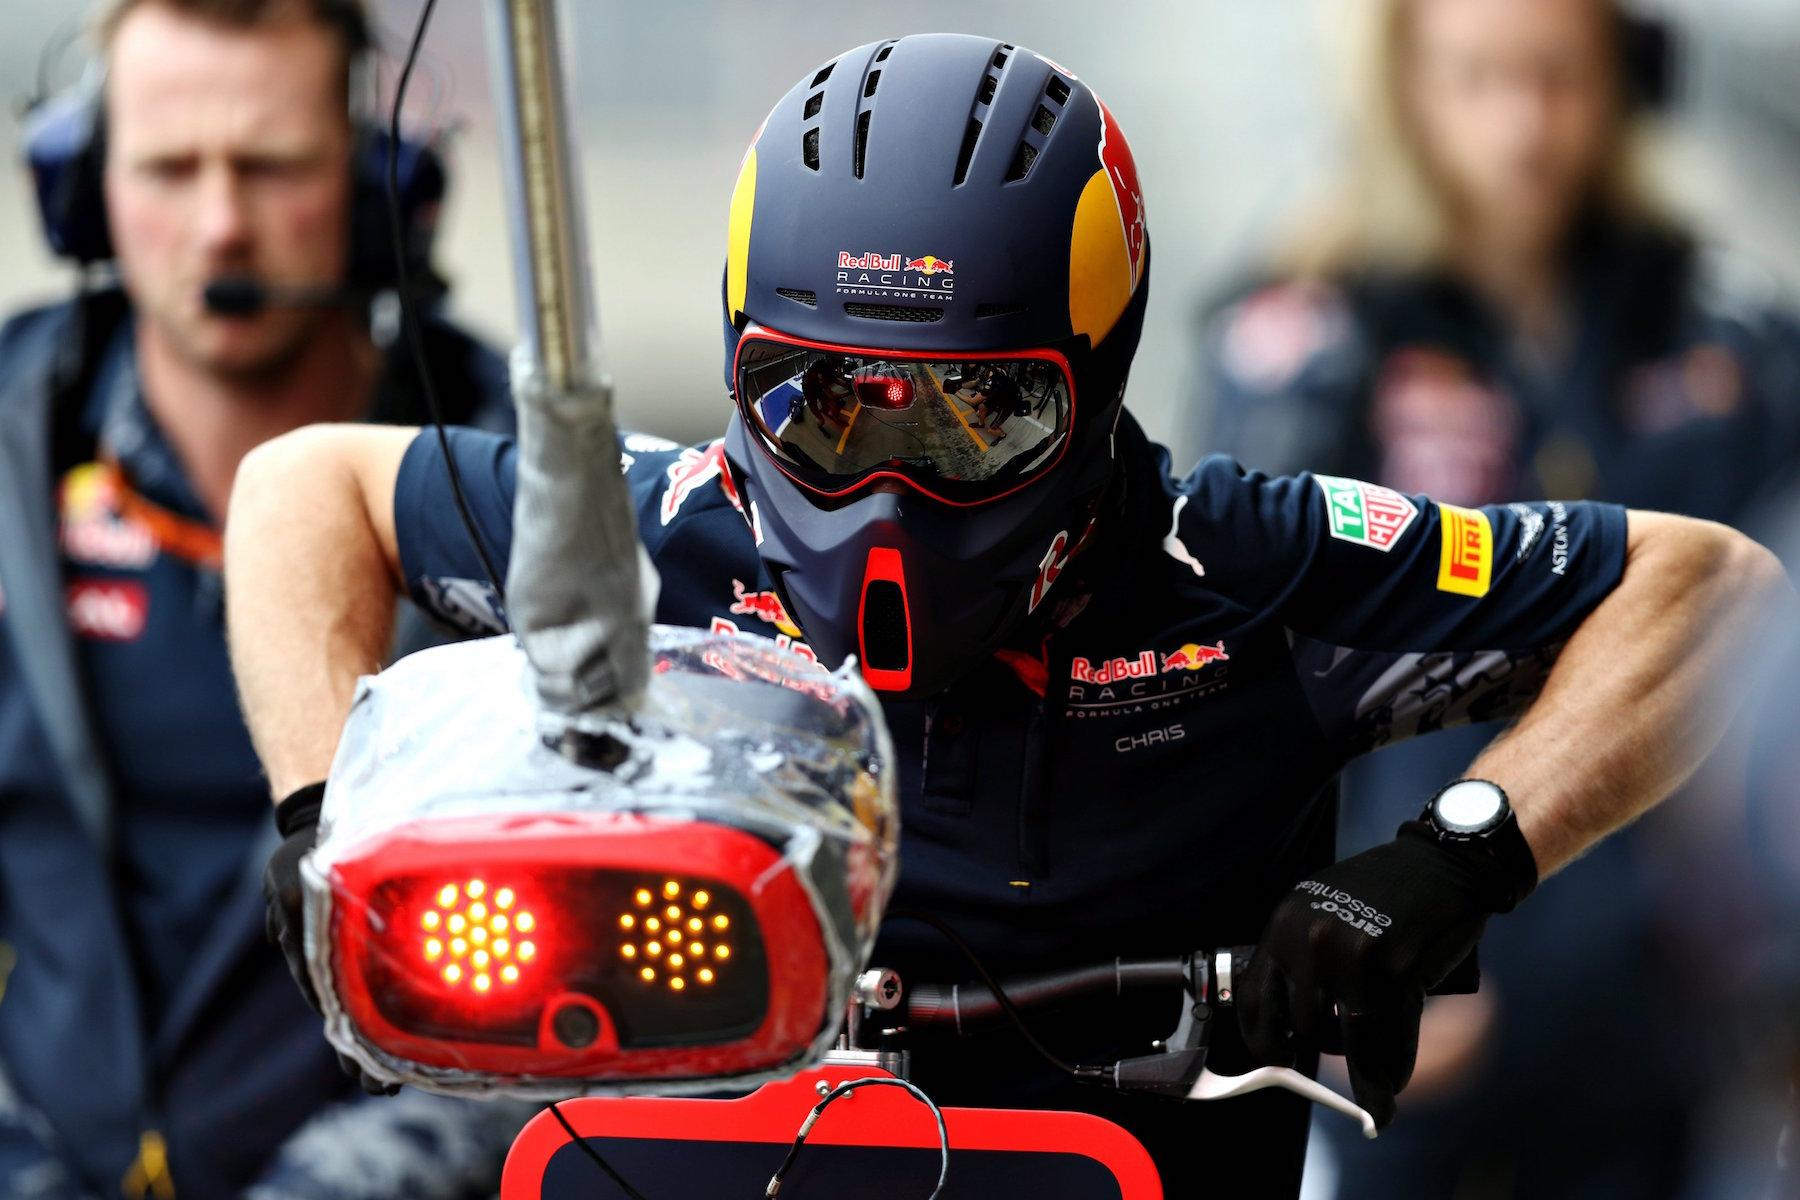 Salracing | Red Bull Racing mechanics